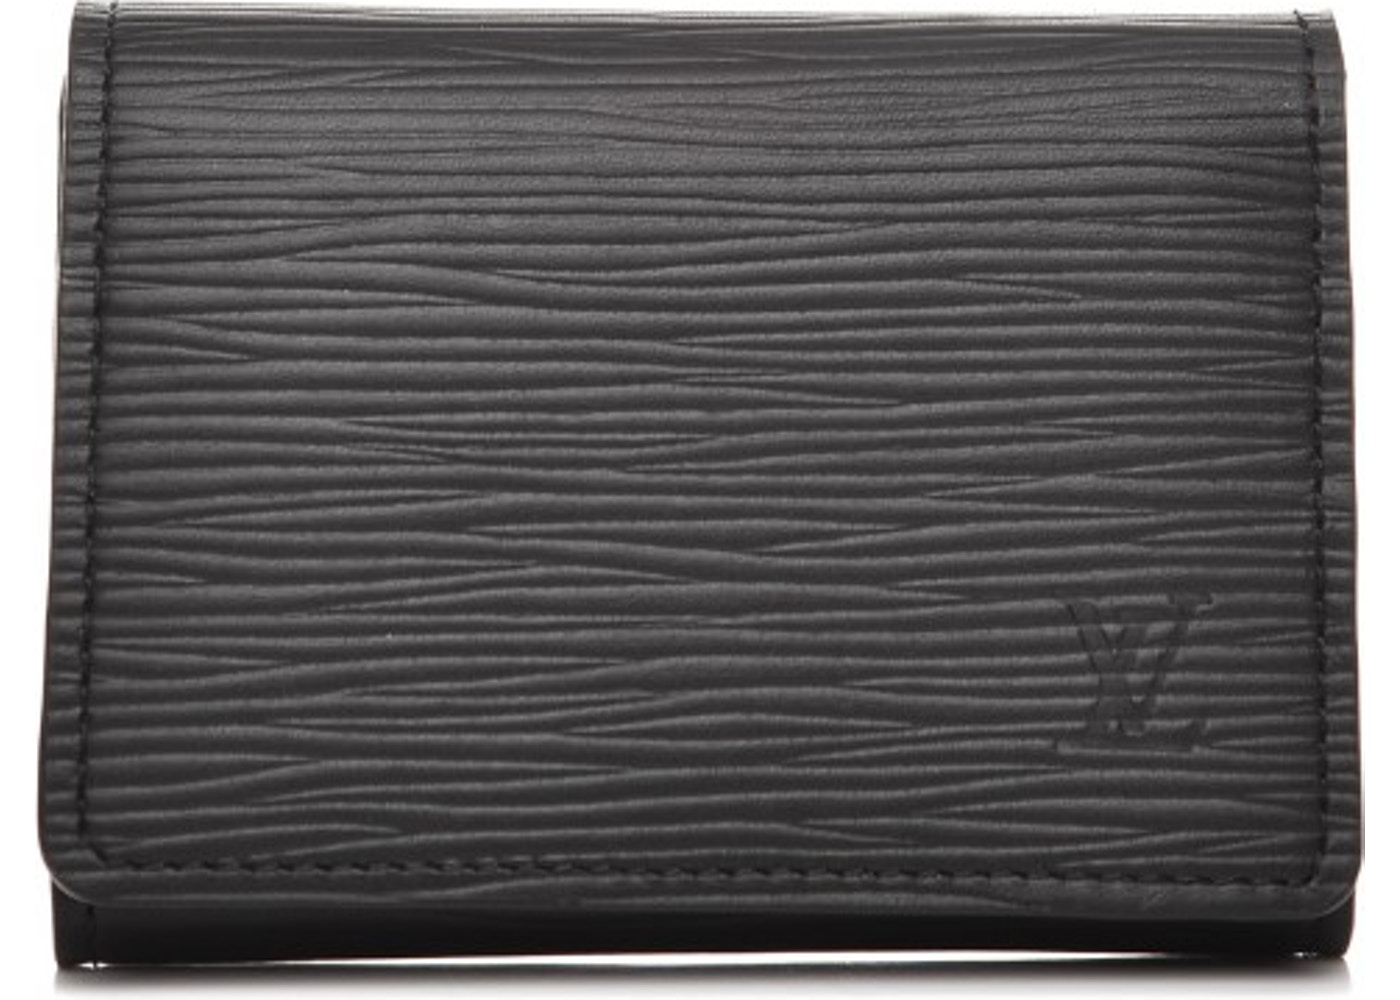 Louis Vuitton Card Holder Envelope Carte De Visite Epi Noir Black